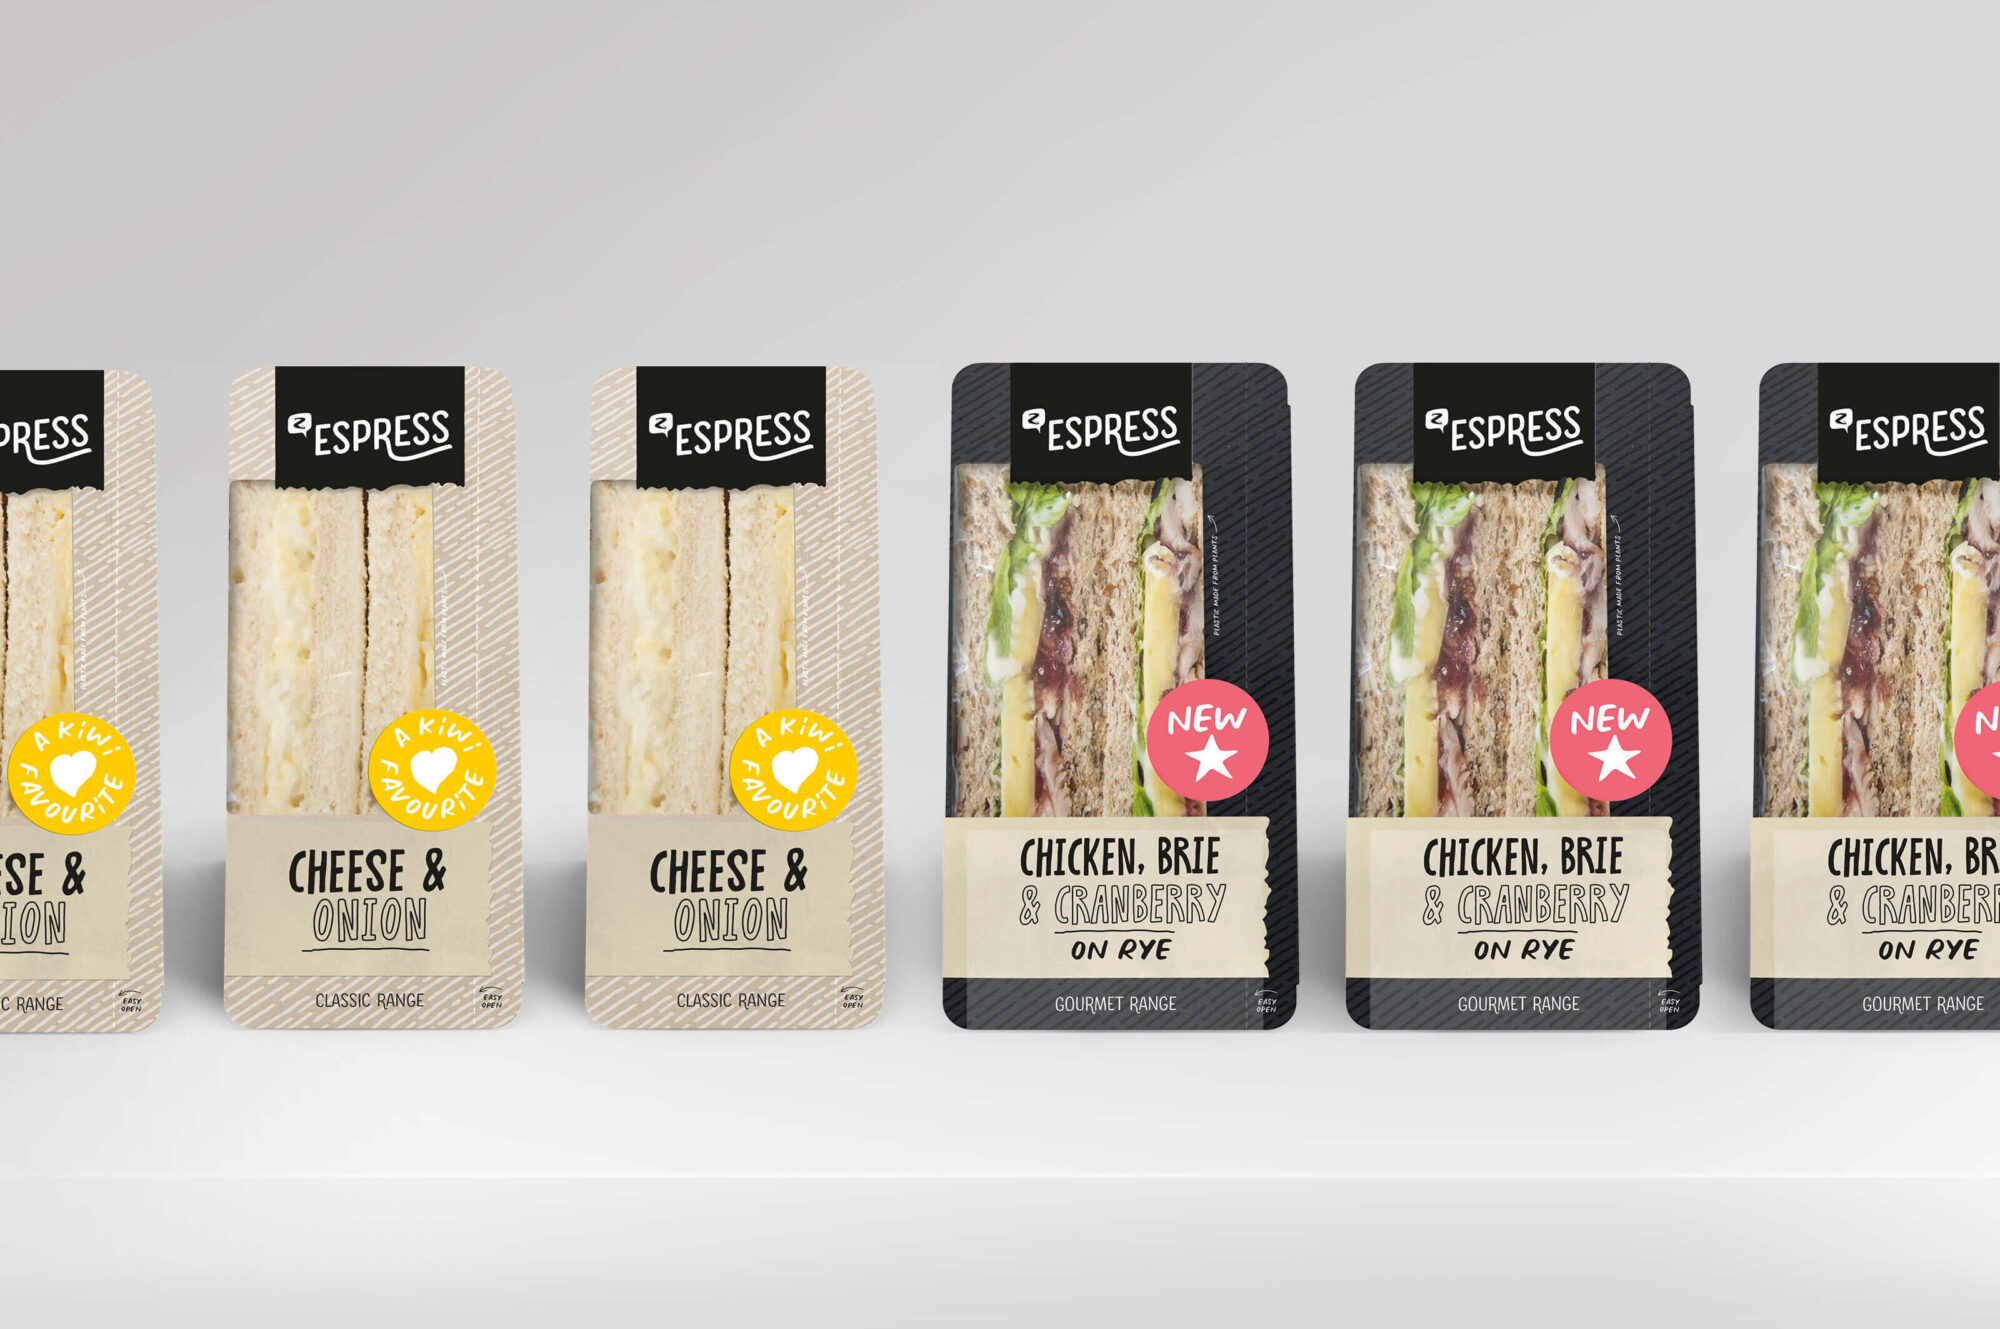 Z Espress sandwiches packaging